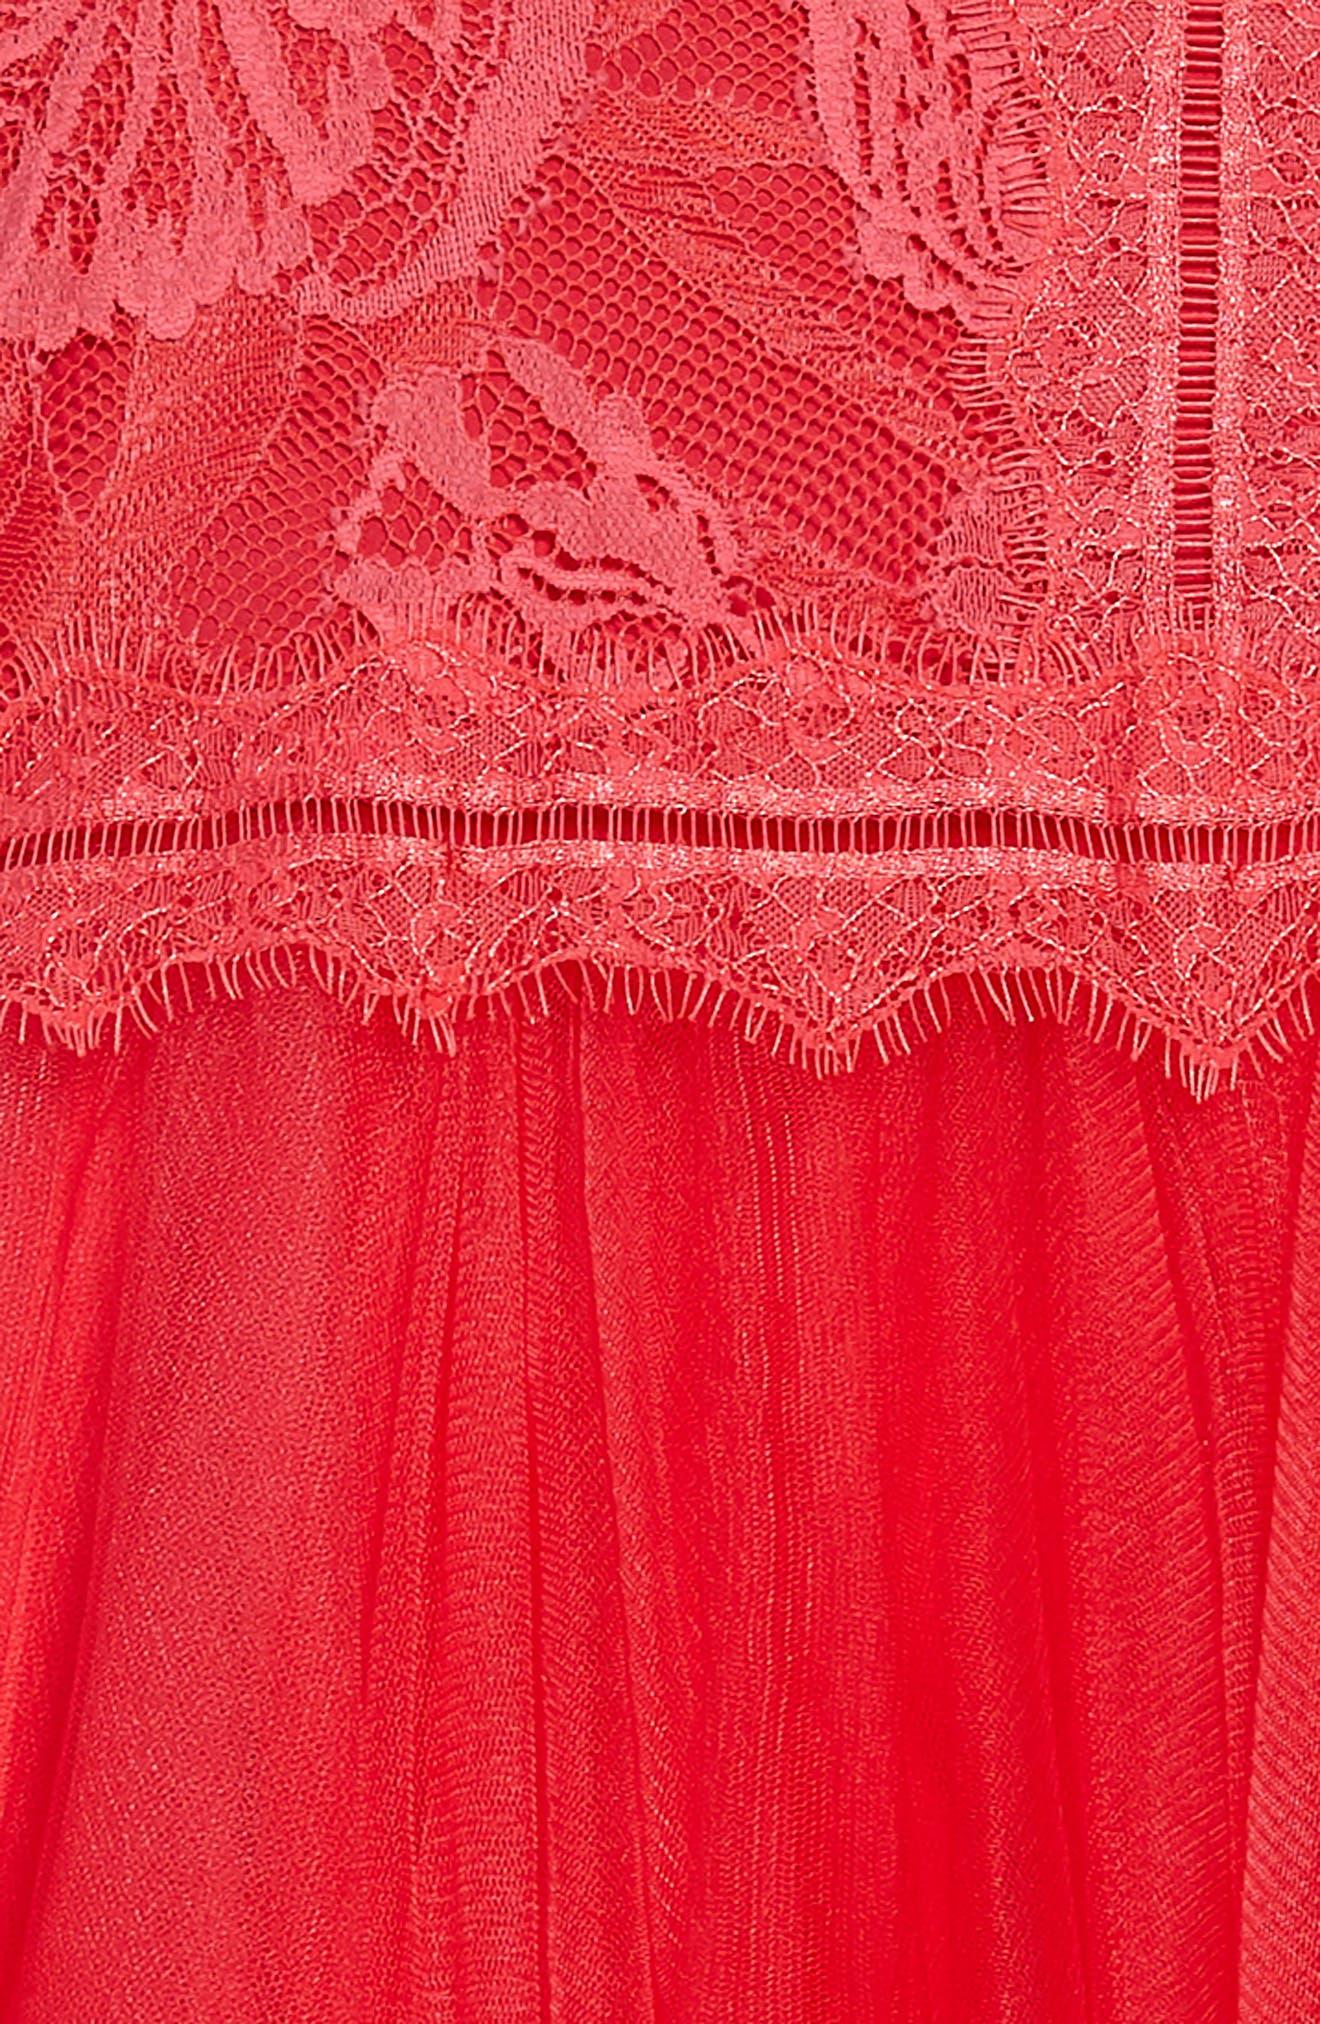 Floral Lace Tulle Dress,                             Alternate thumbnail 3, color,                             605